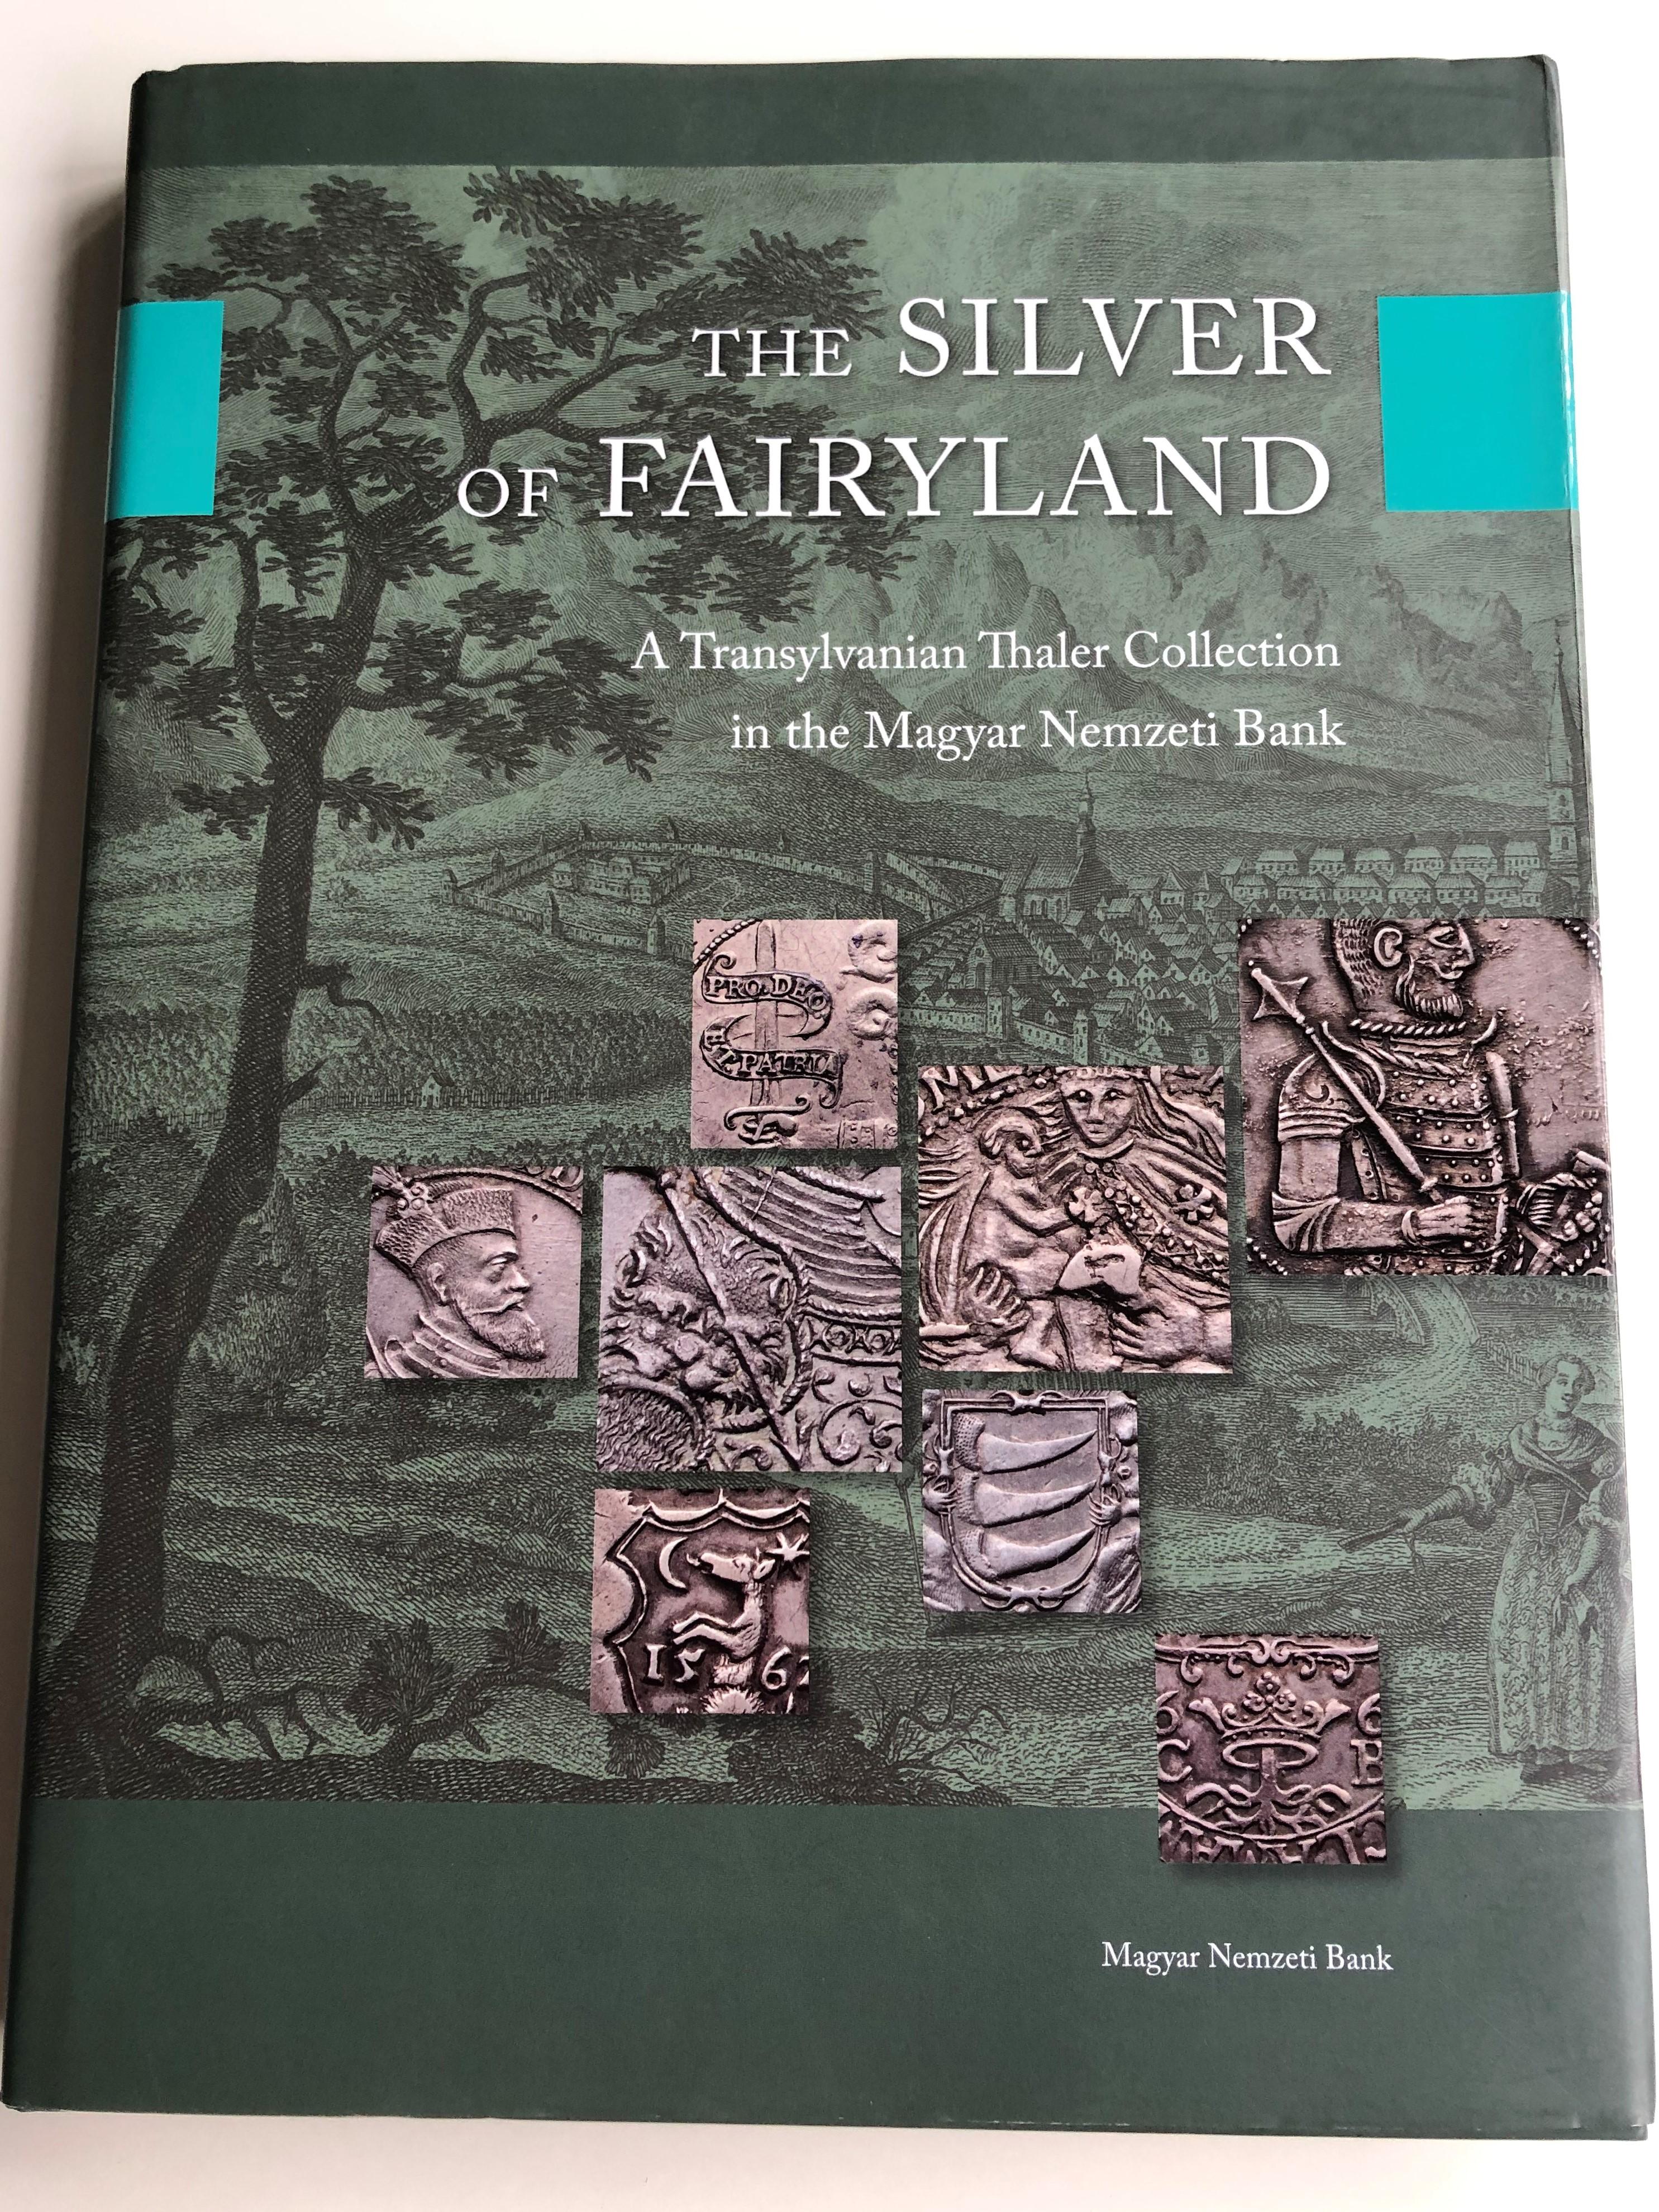 the-silver-of-fairyland-by-csaba-t-th-a-transylvanian-thaler-collection-in-the-magyar-nemzeti-bank-1.jpg